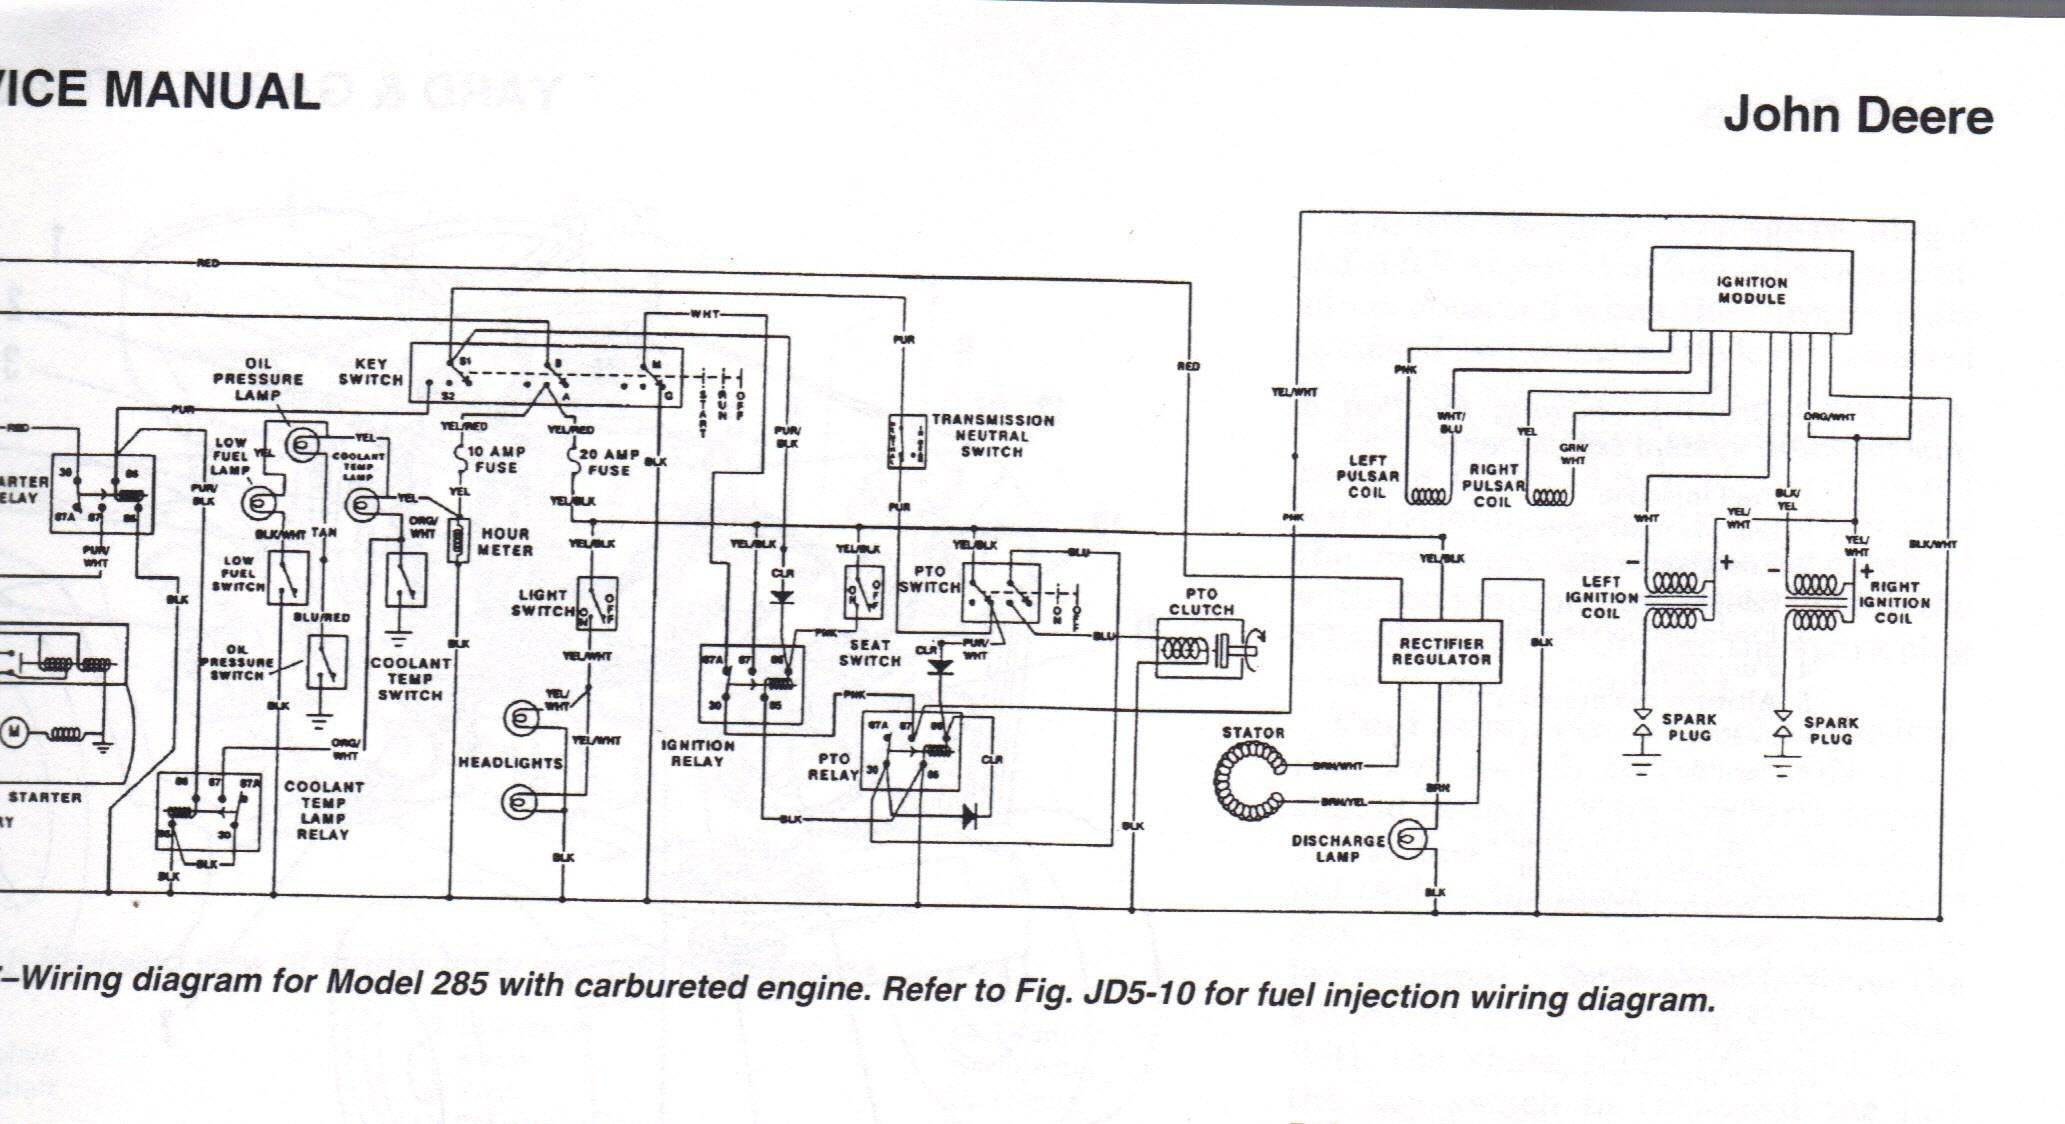 john deere 318 garden tractor wiring diagram fresh within or 316